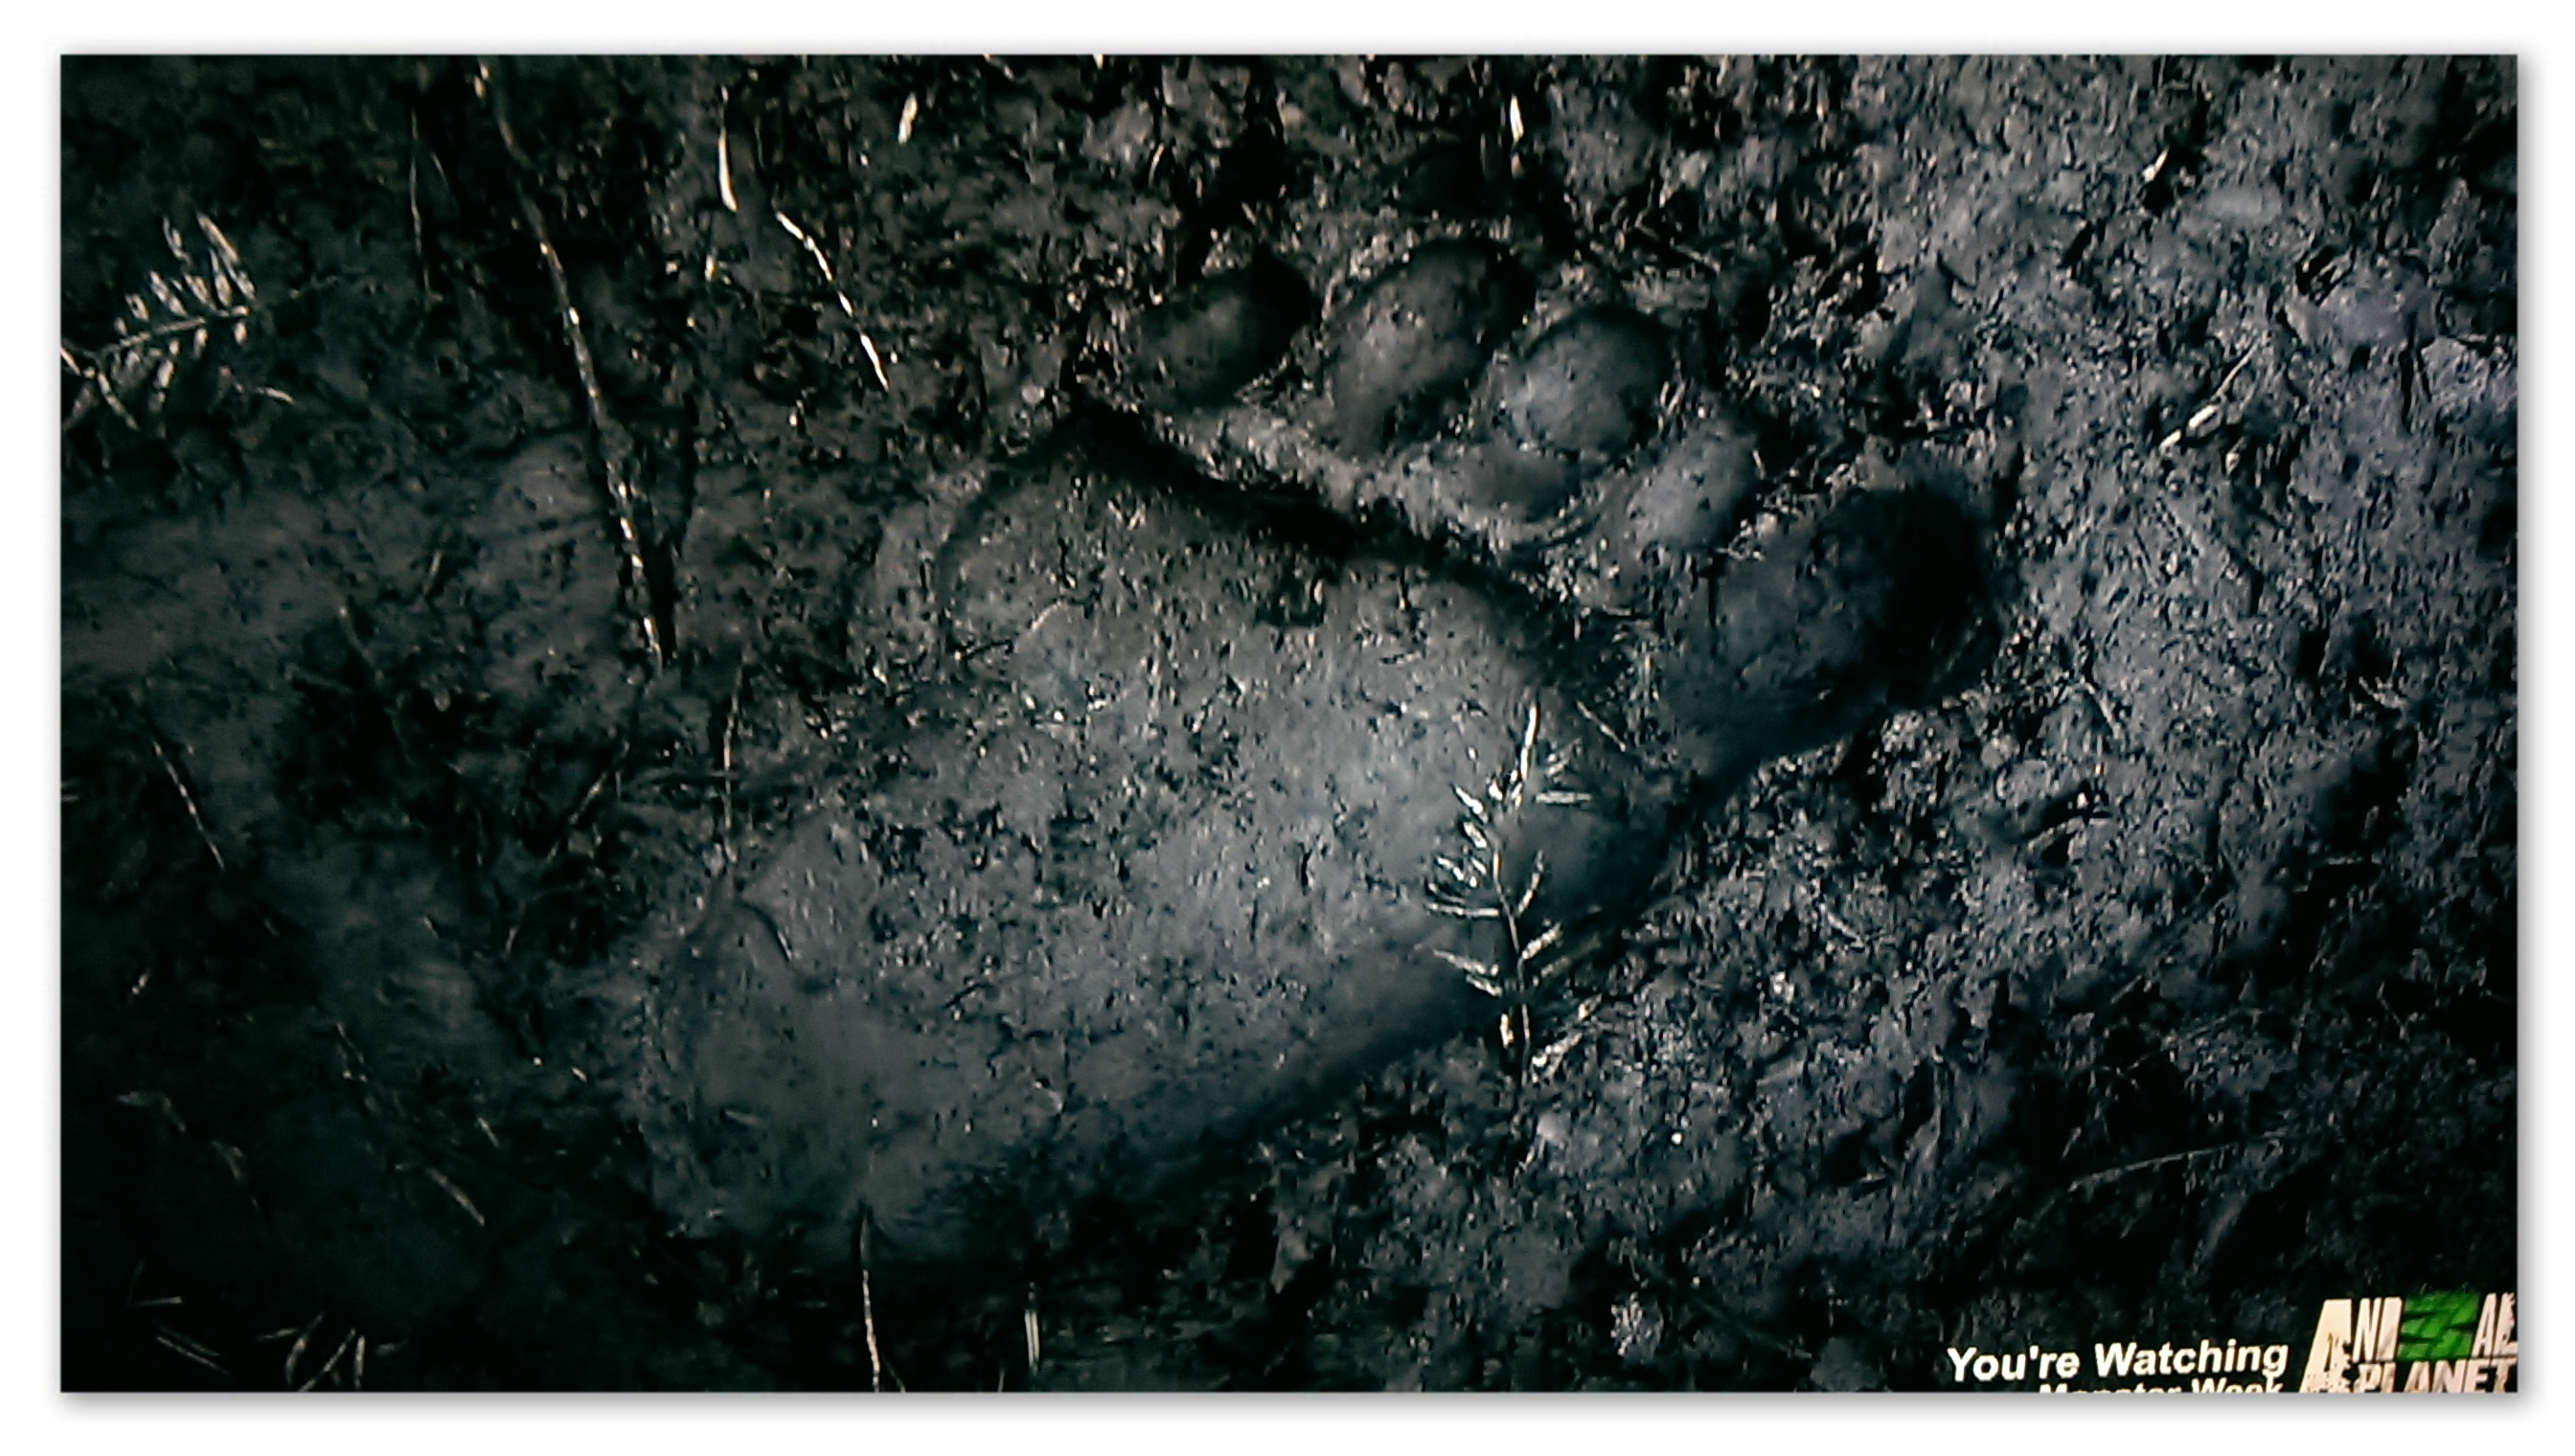 Image of a Yeti footprint